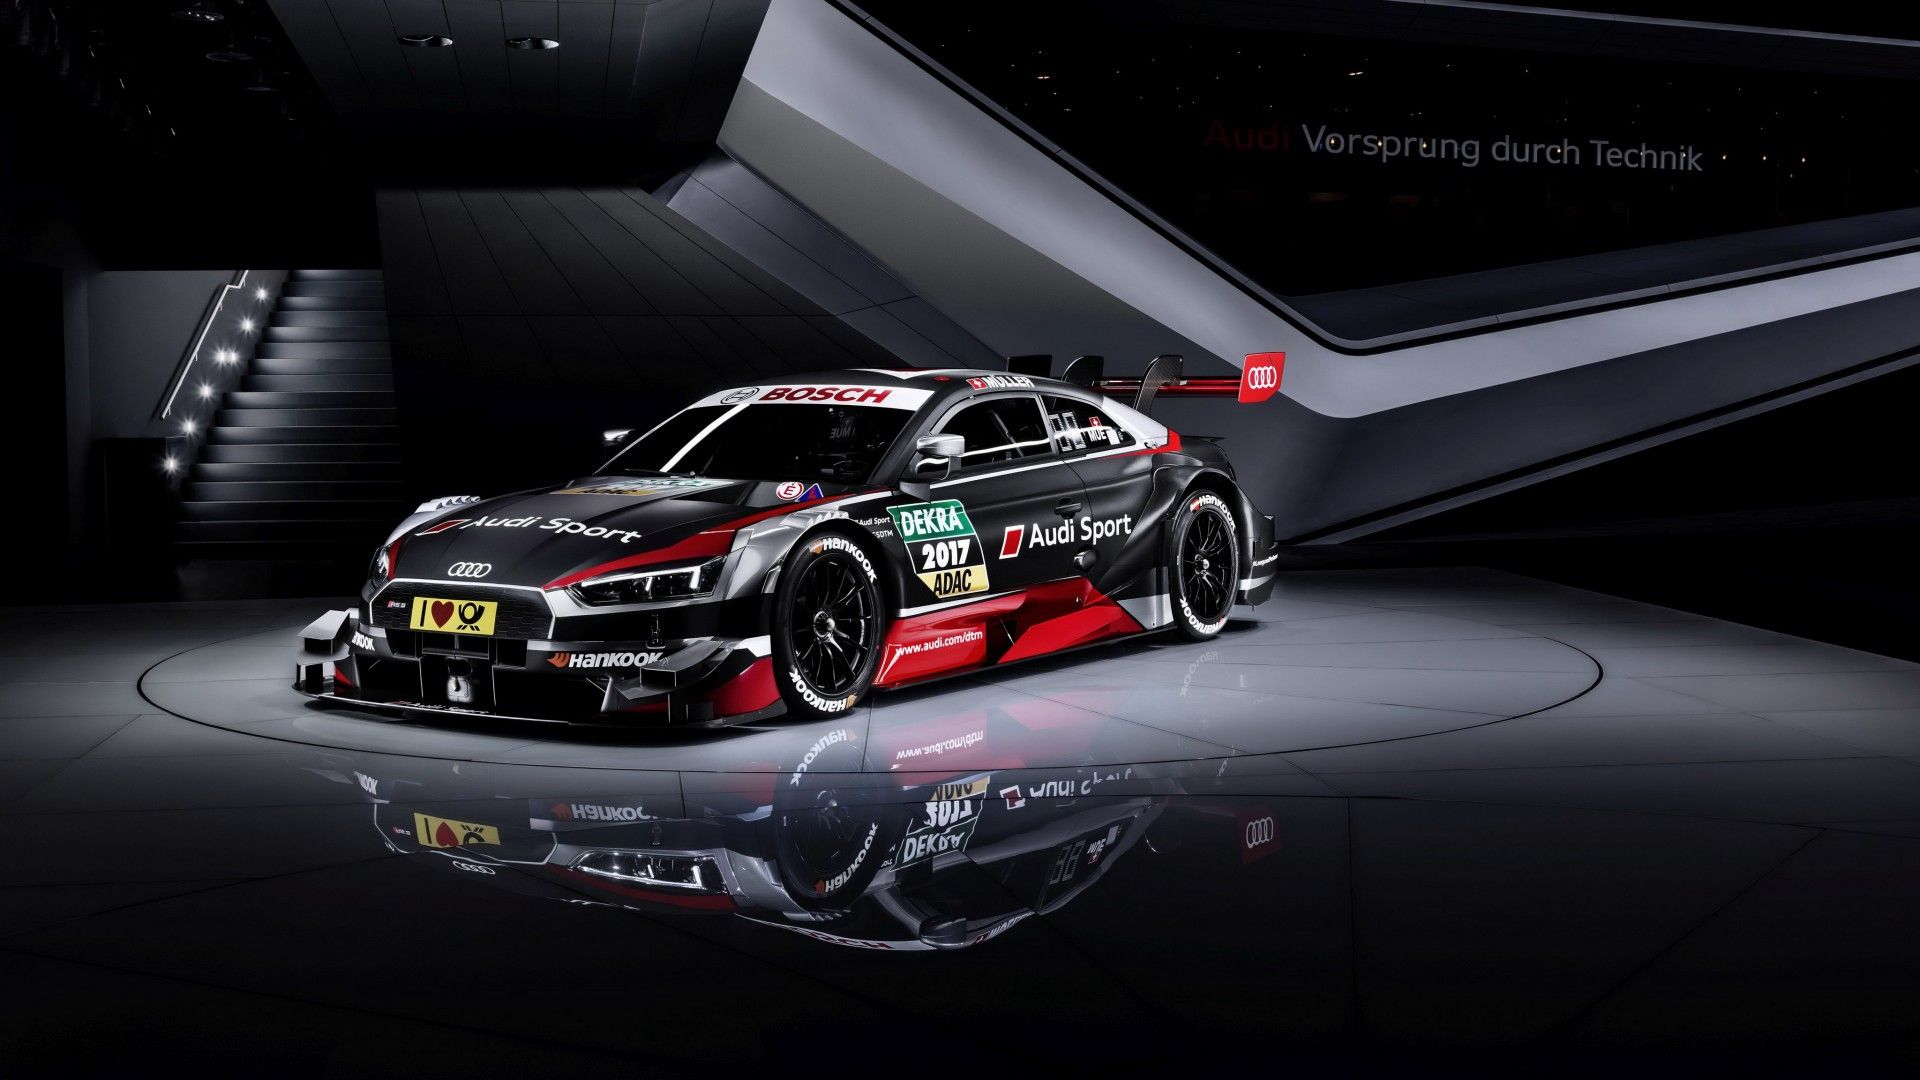 Audi Rs 5 Coupe Dtm Wallpaper Audi Rs Audi Rs 5 Audi Rs5